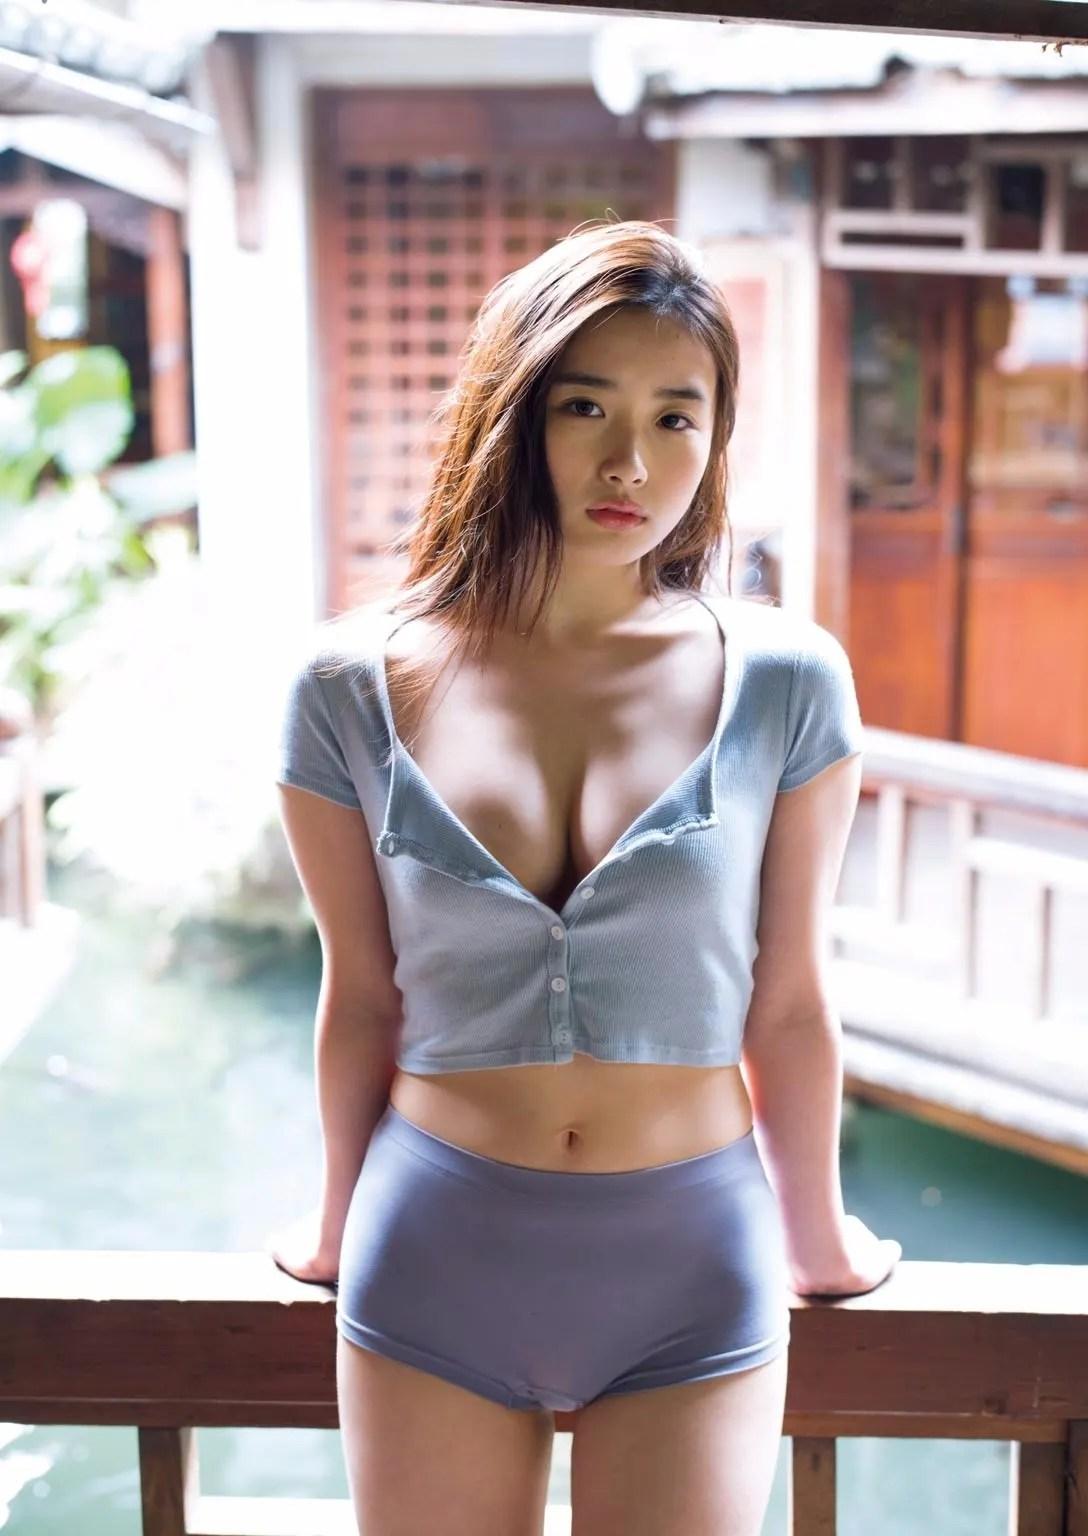 https://i1.wp.com/blogimg.goo.ne.jp/user_image/6e/e0/04447a909631fbdee7b97f1198304d52.jpg